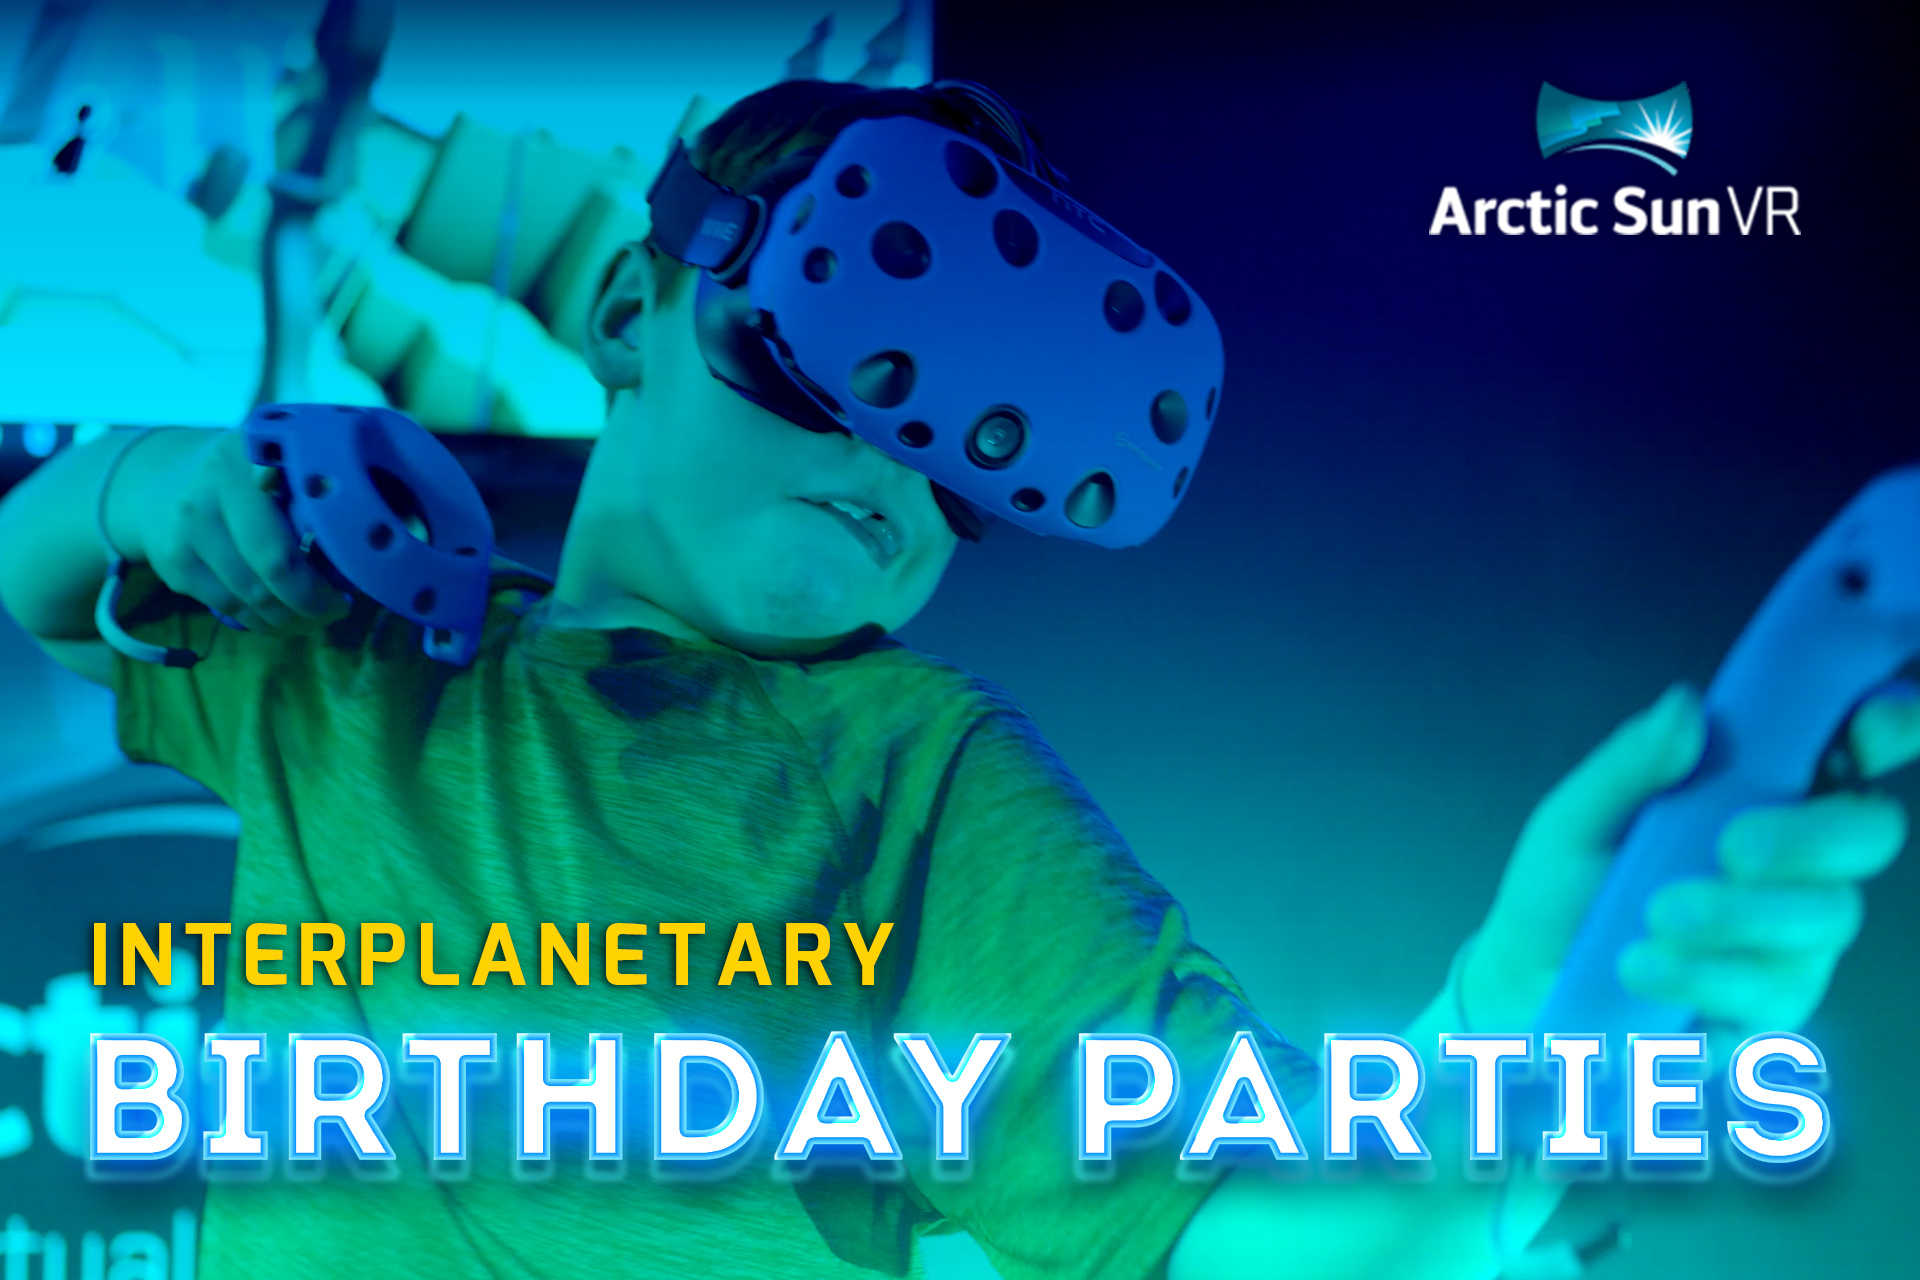 Arctic-Sun-VR-PartiesEvents-3.jpg